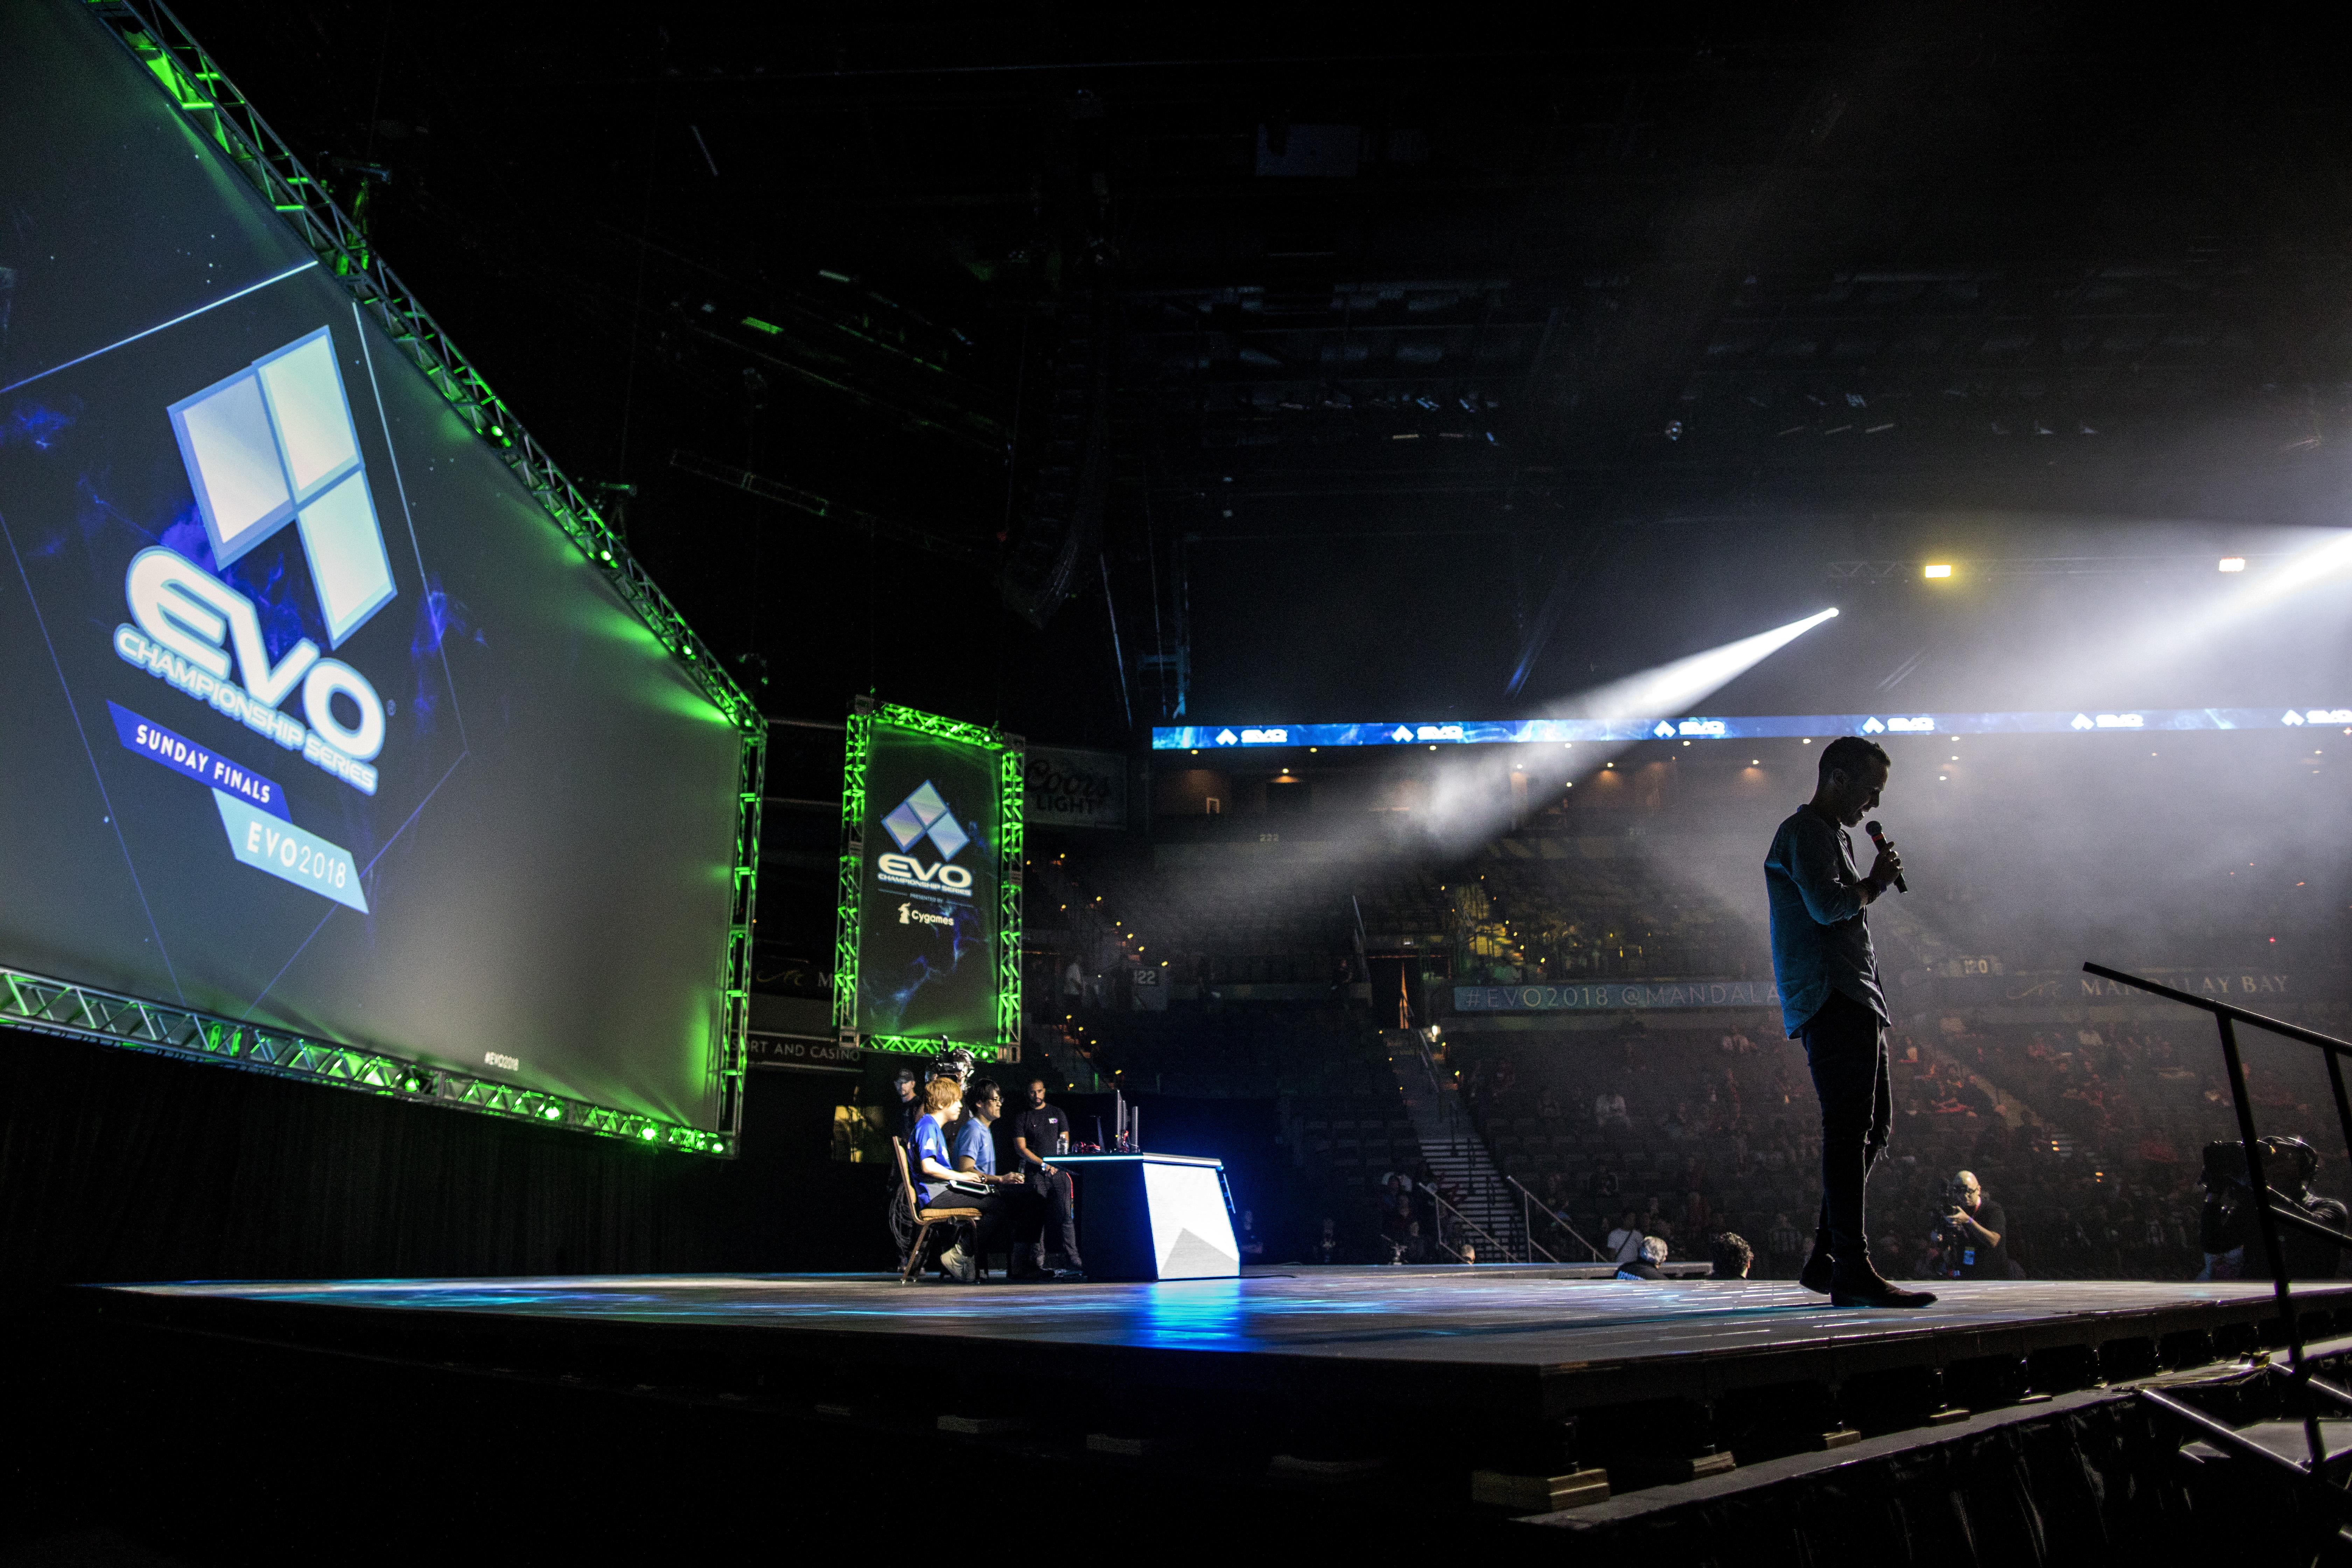 Evo 2020 canceled after co-founder abuse allegations